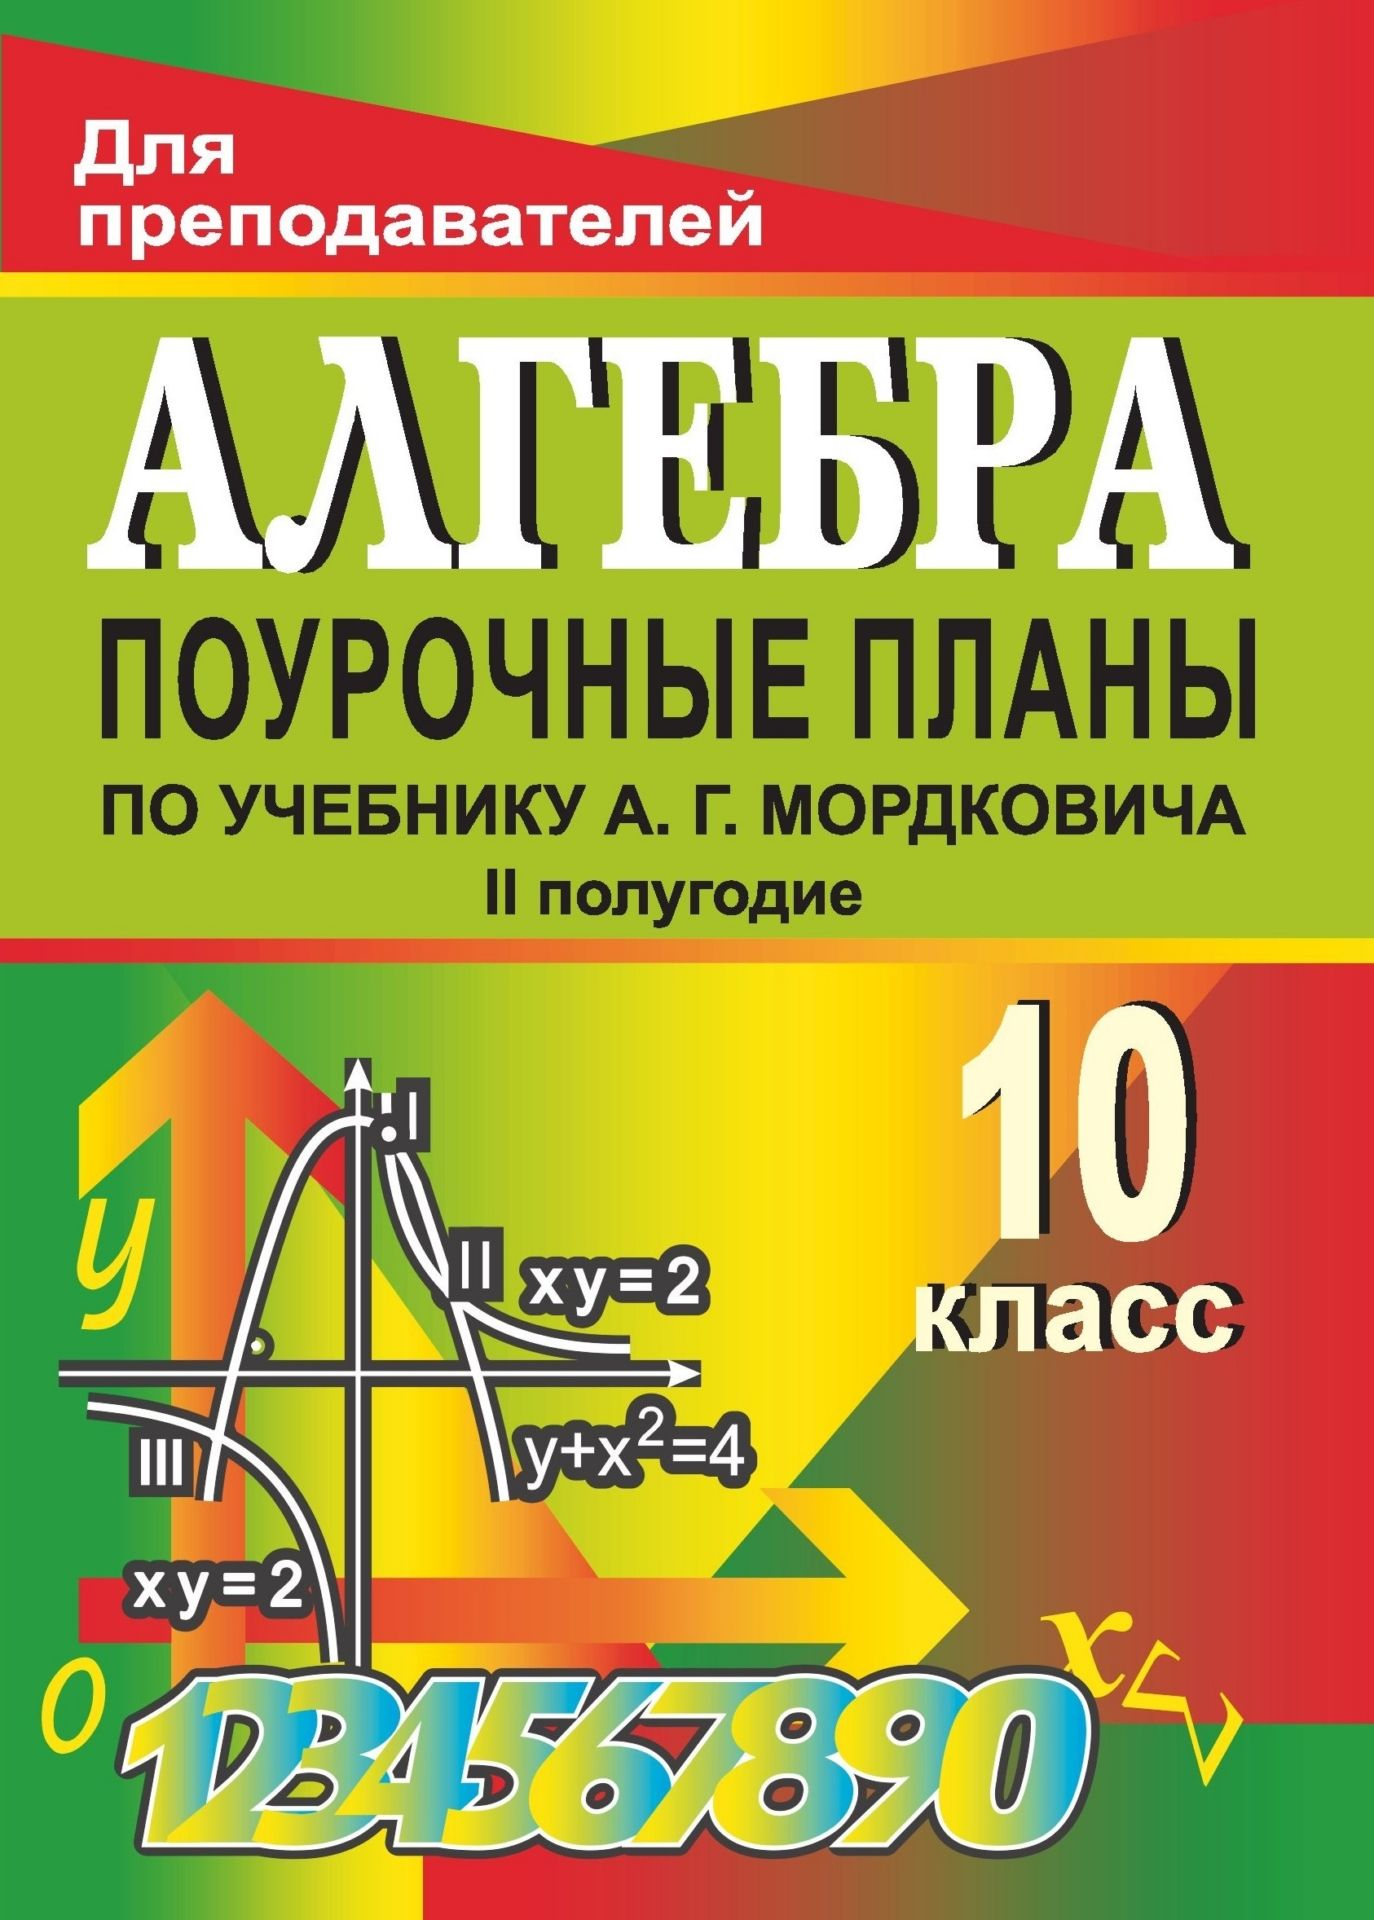 Алгебра и начала анализа. 10 класс. II полугодие: поурочные планы по учебнику А. Г. Мордковича